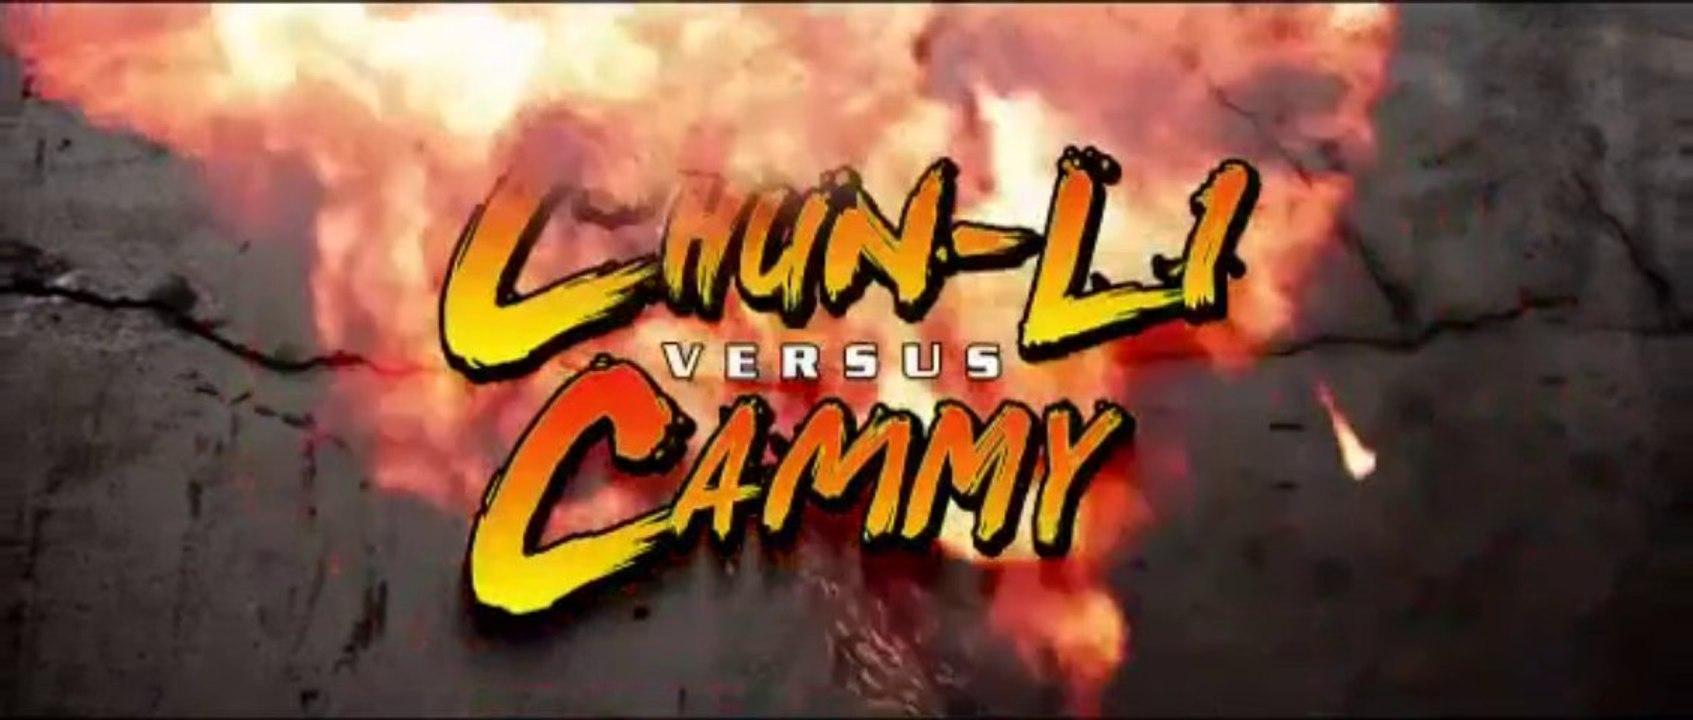 Chun-Li sparring Mod losing scenes!   Chun-Li barefoot Mod